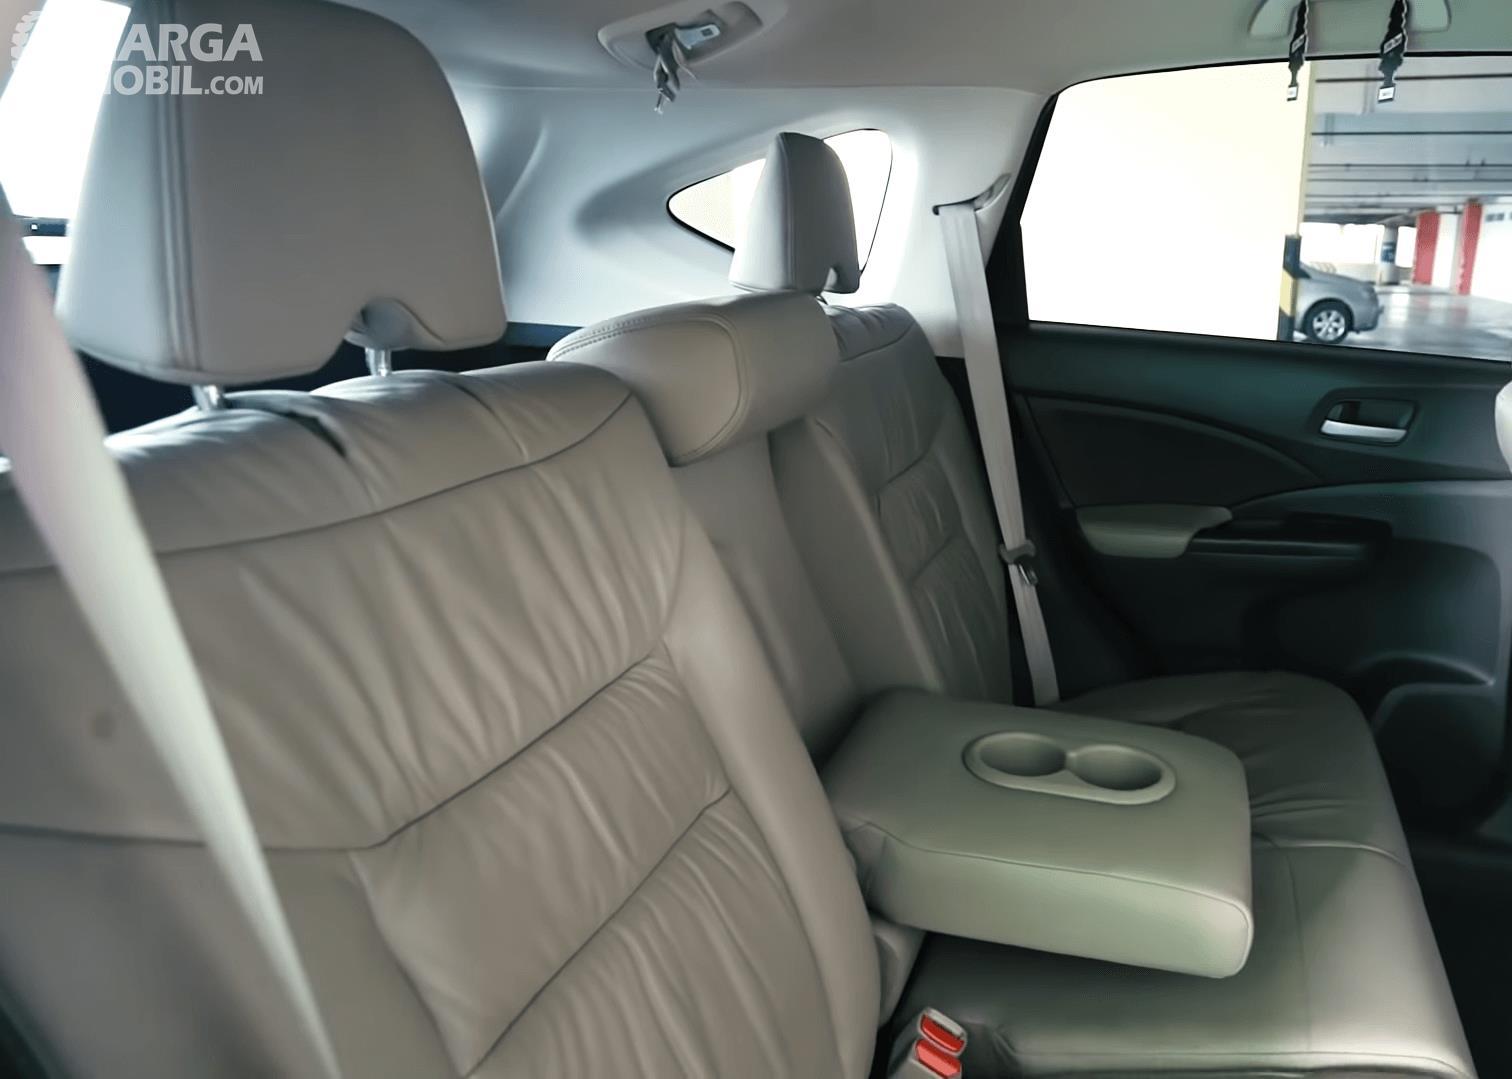 Gambar ini menunjukkan jok belakang mobil Honda CR-V 2.4 Prestige 2013